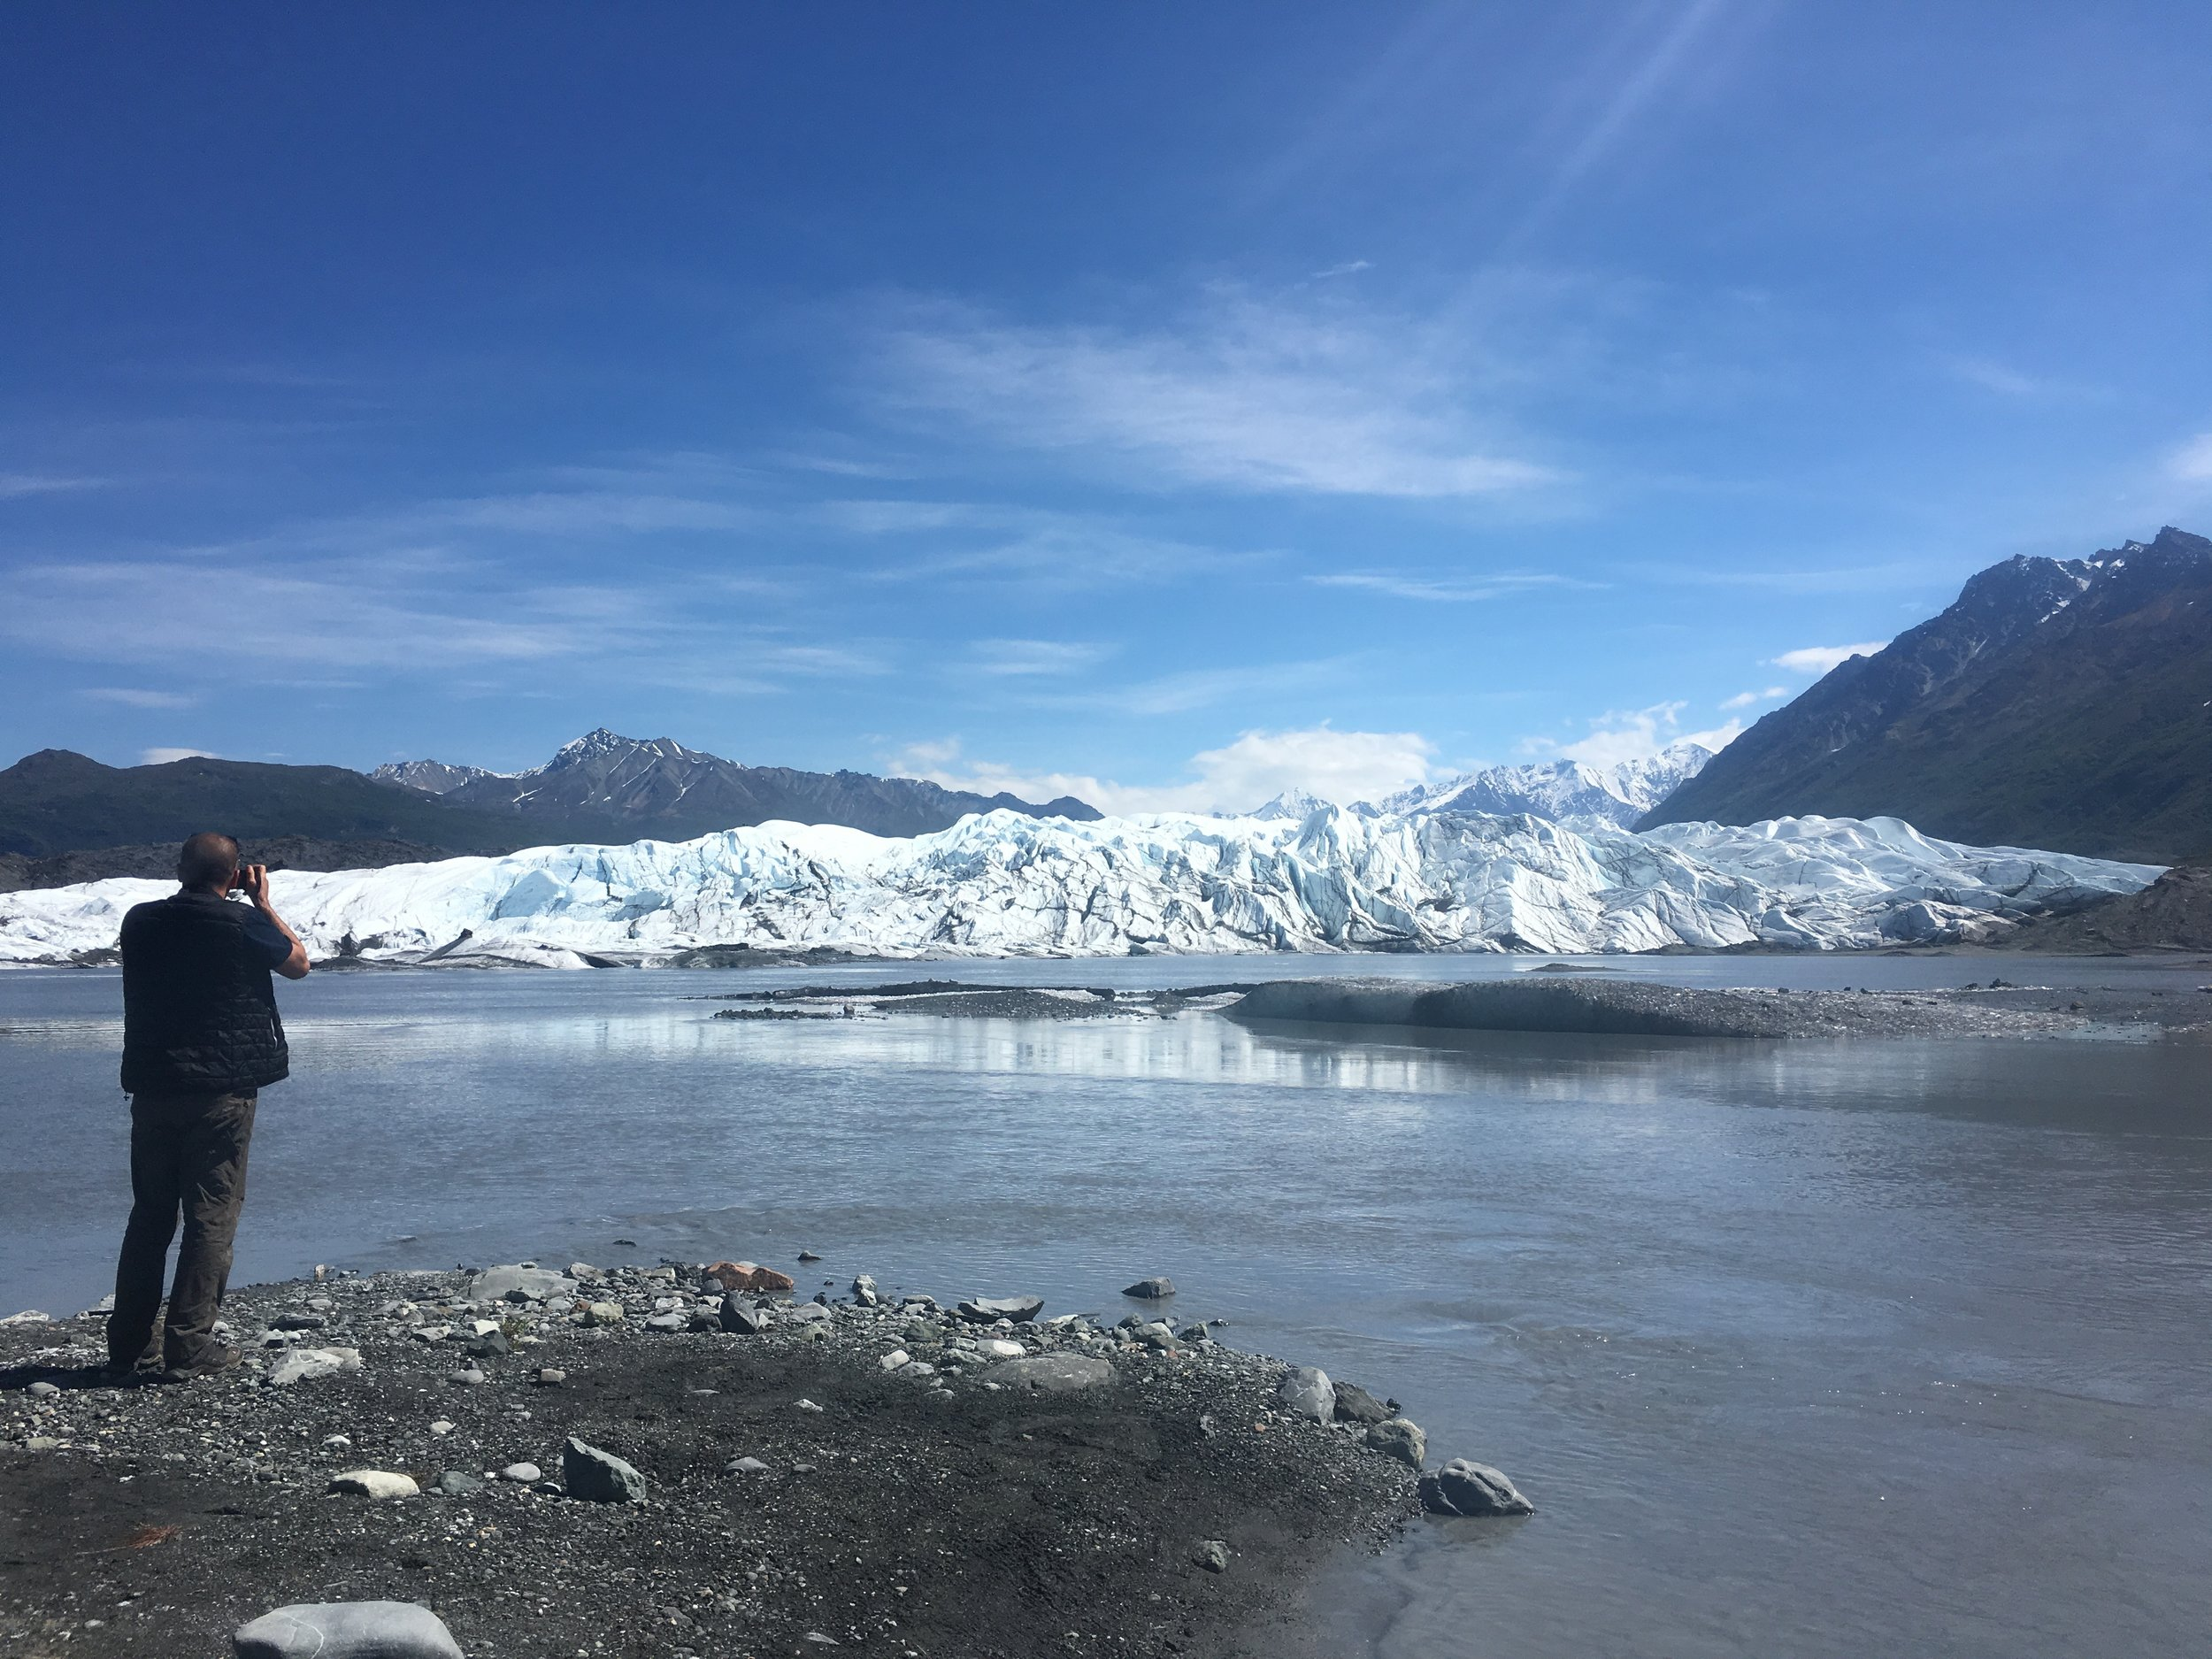 Benji taking photos of the edge of Matanuska glacier from across the water, near the parking area.